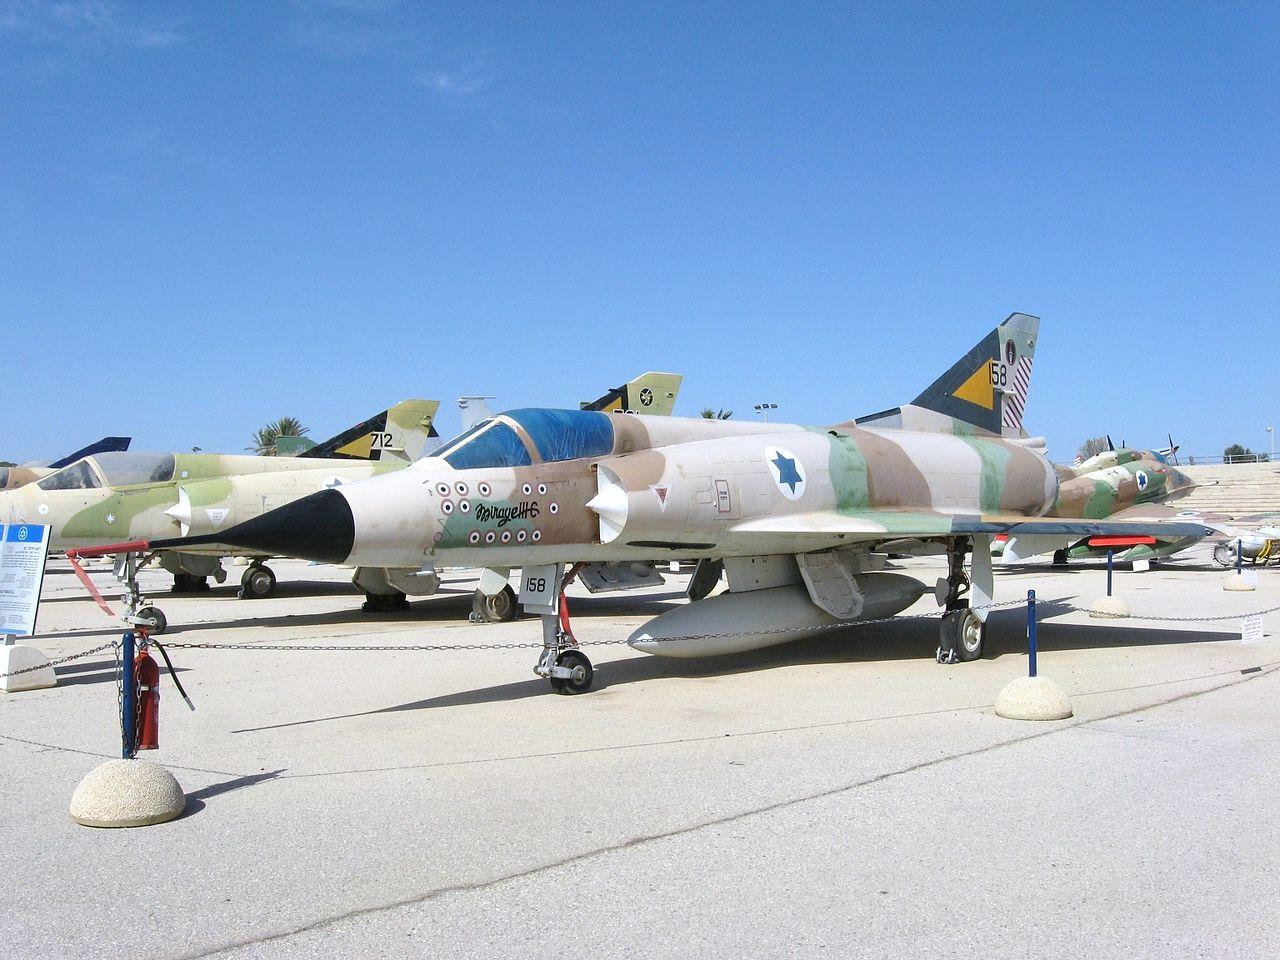 Israeli Air Force Mirage IIICJ 158 at the Israeli Air Force Museum in Hatzerim